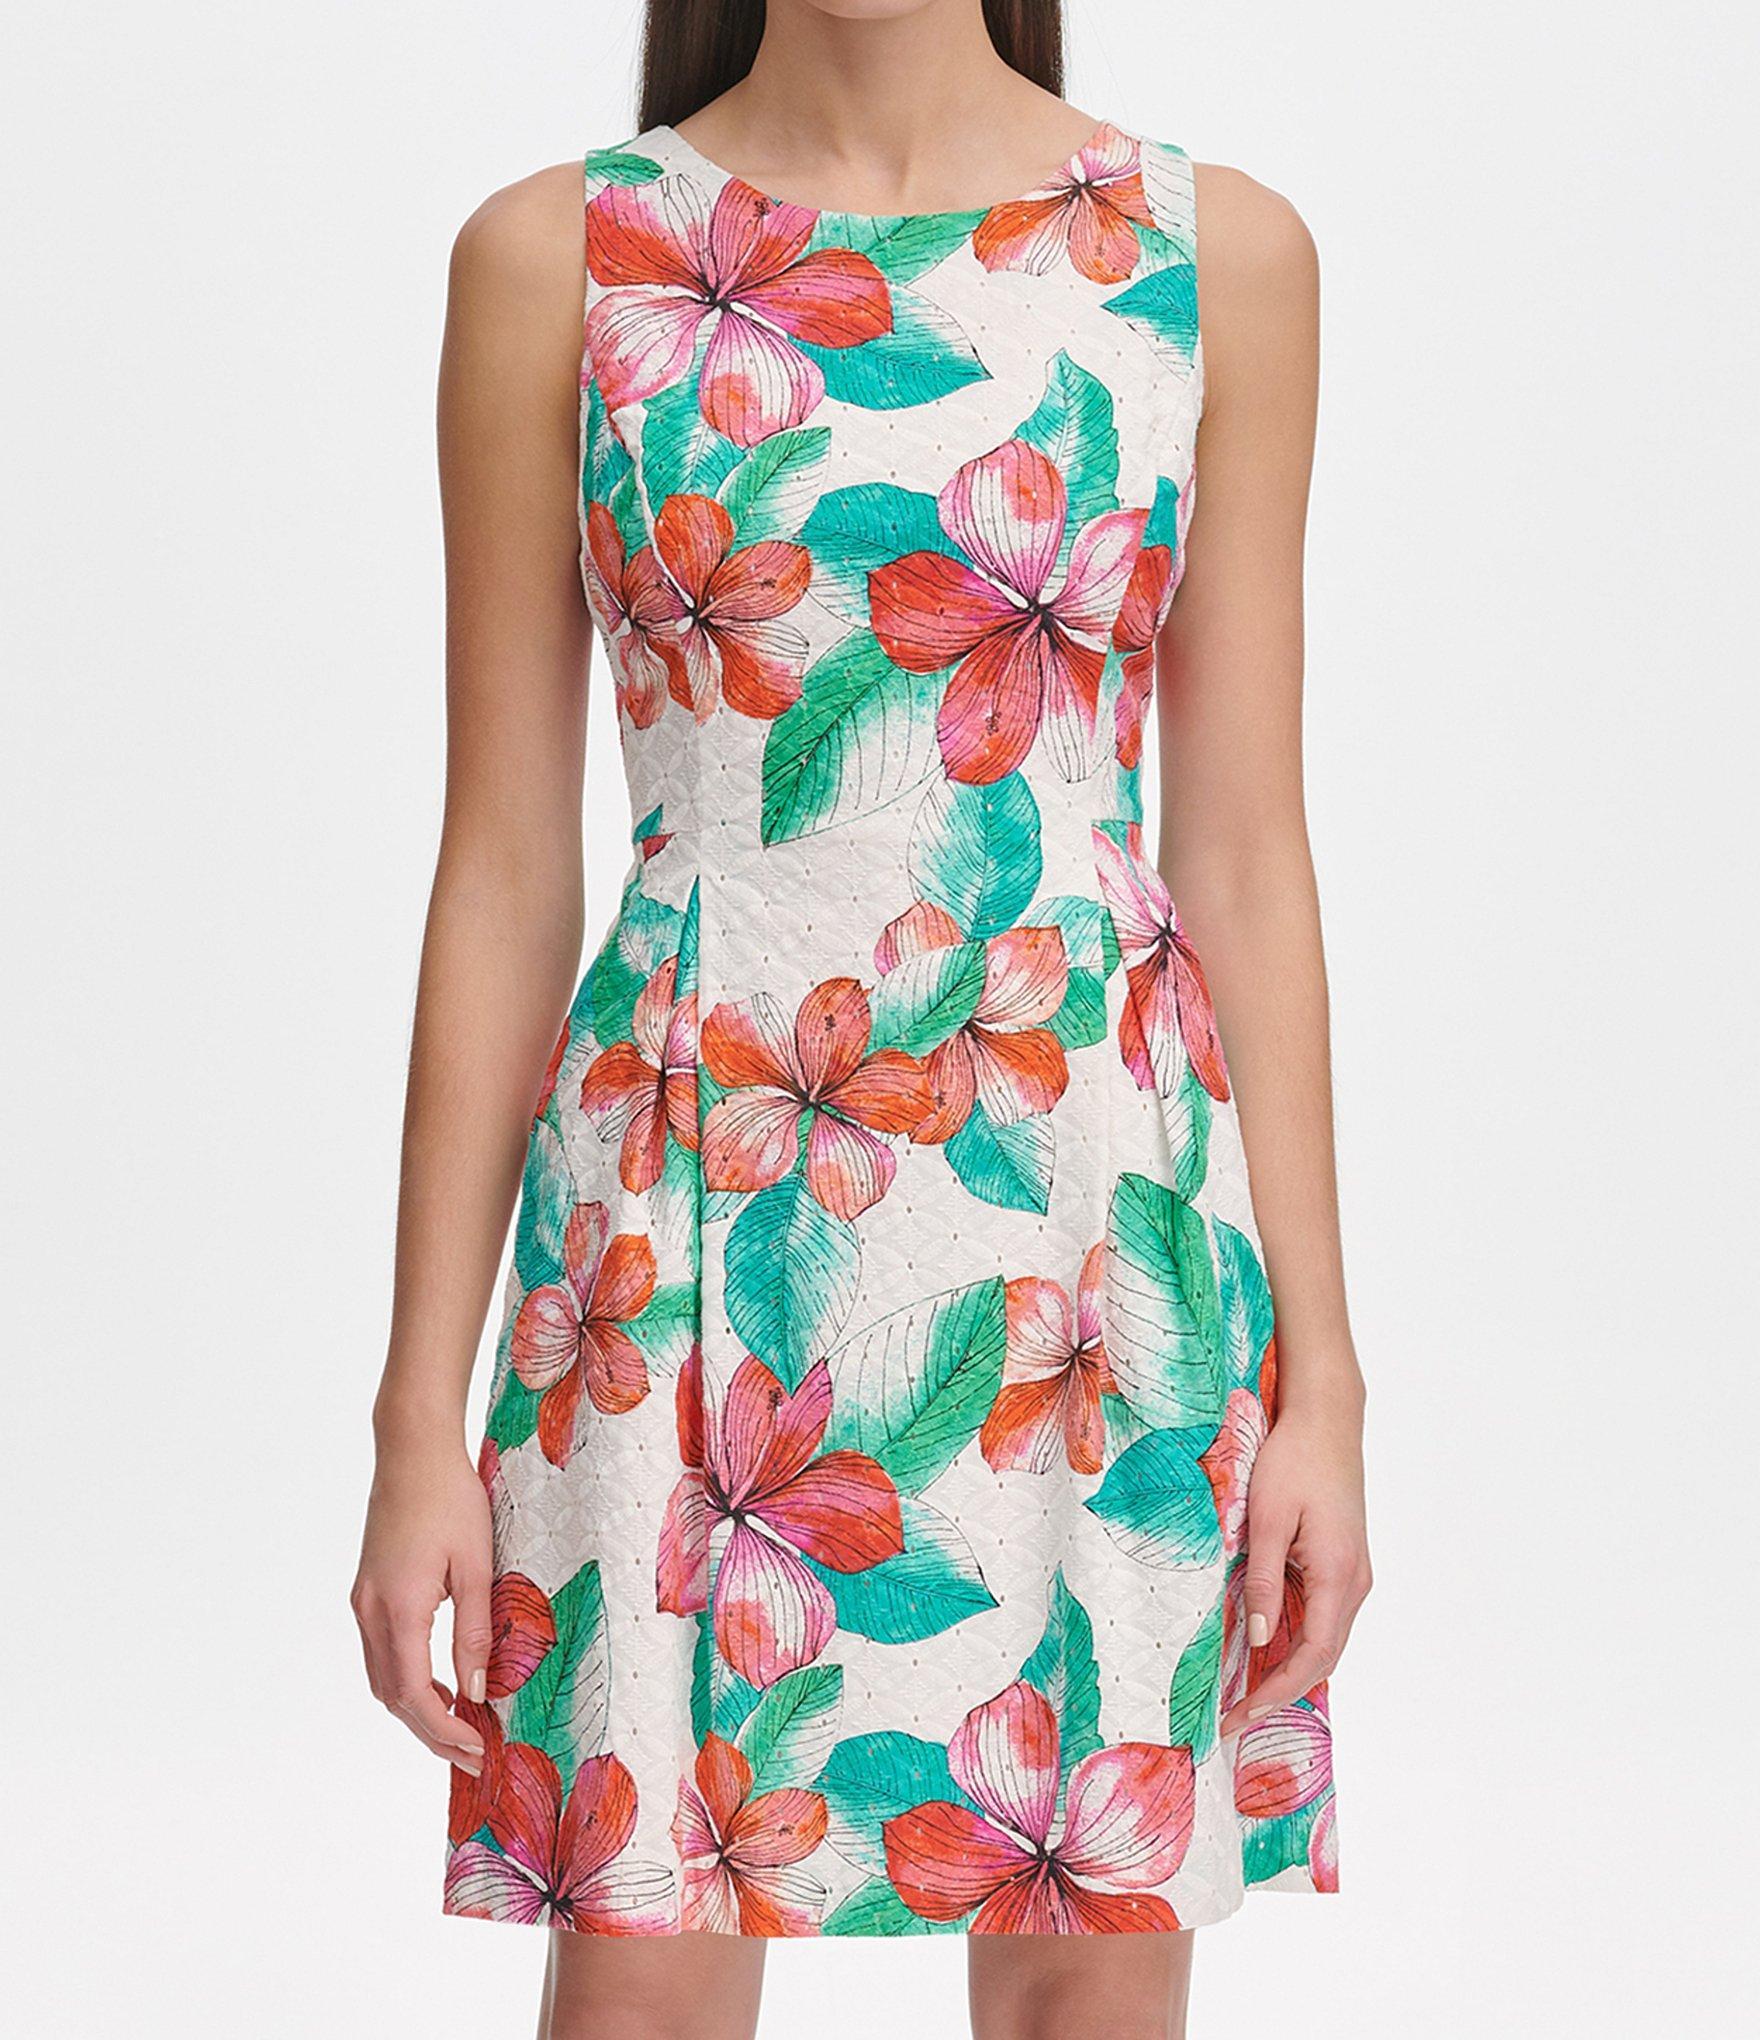 2af91556faf24 Tommy Hilfiger - White Eyelet Hibiscus Floral Print Fit & Flare Dress -  Lyst. View fullscreen